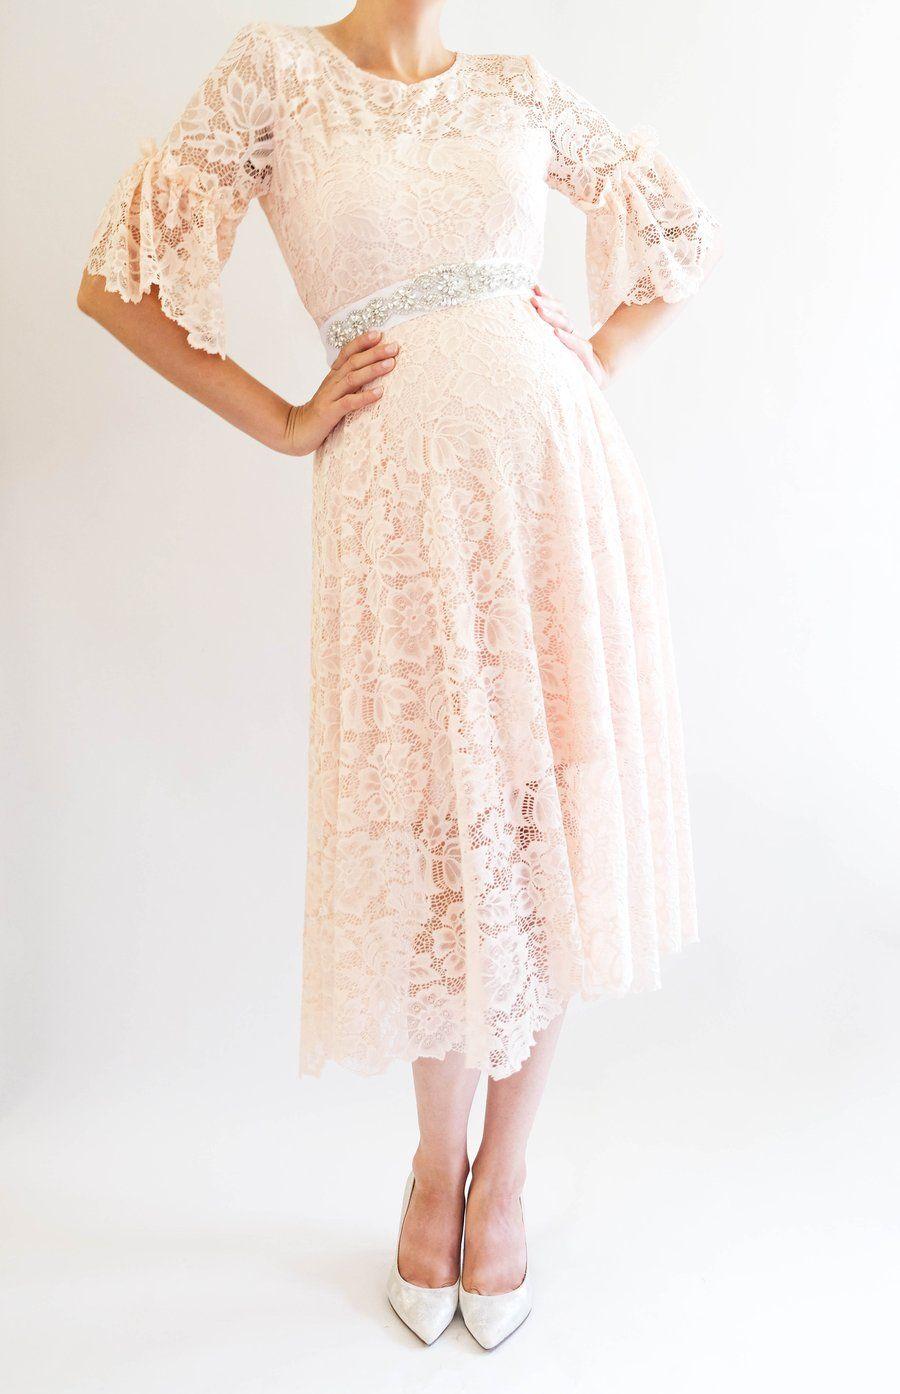 Baby Shower Dress Lace Baby Shower Dress Short Baby Shower Dress This Short Maternity Dress Is Jus Lace Baby Shower Dress Short Dresses Baby Shower Dresses [ 1394 x 900 Pixel ]